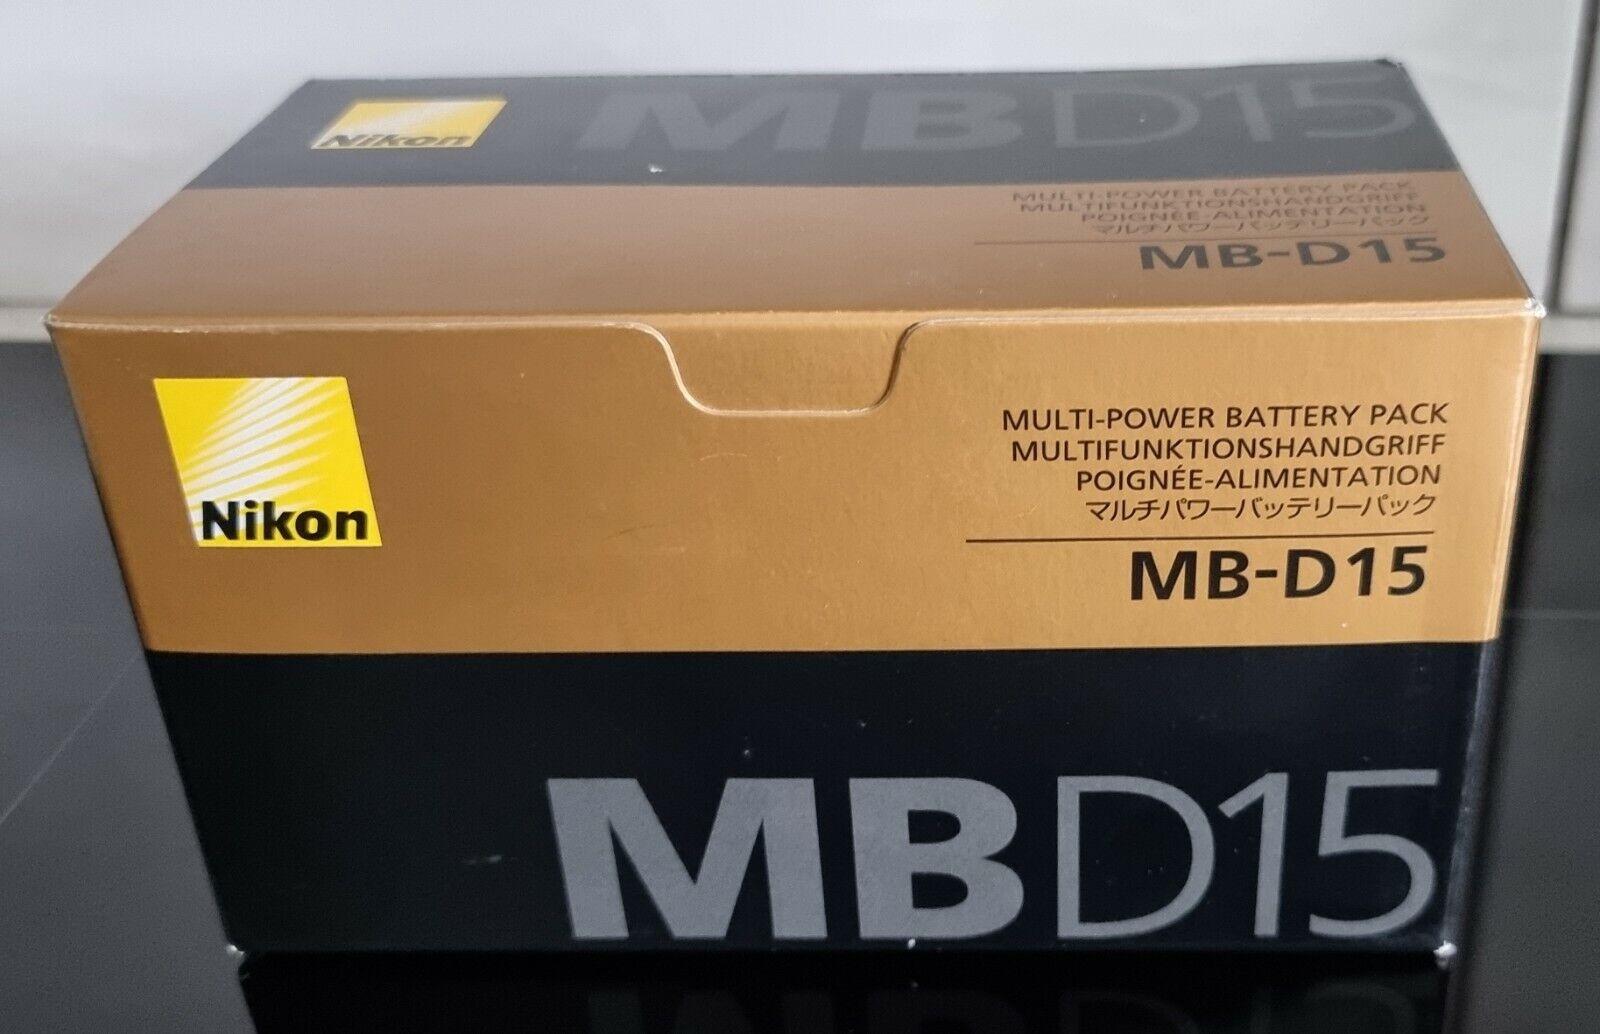 Genuine Nikon MB-D15 Battery Grip for Nikon D7100 - Boxed